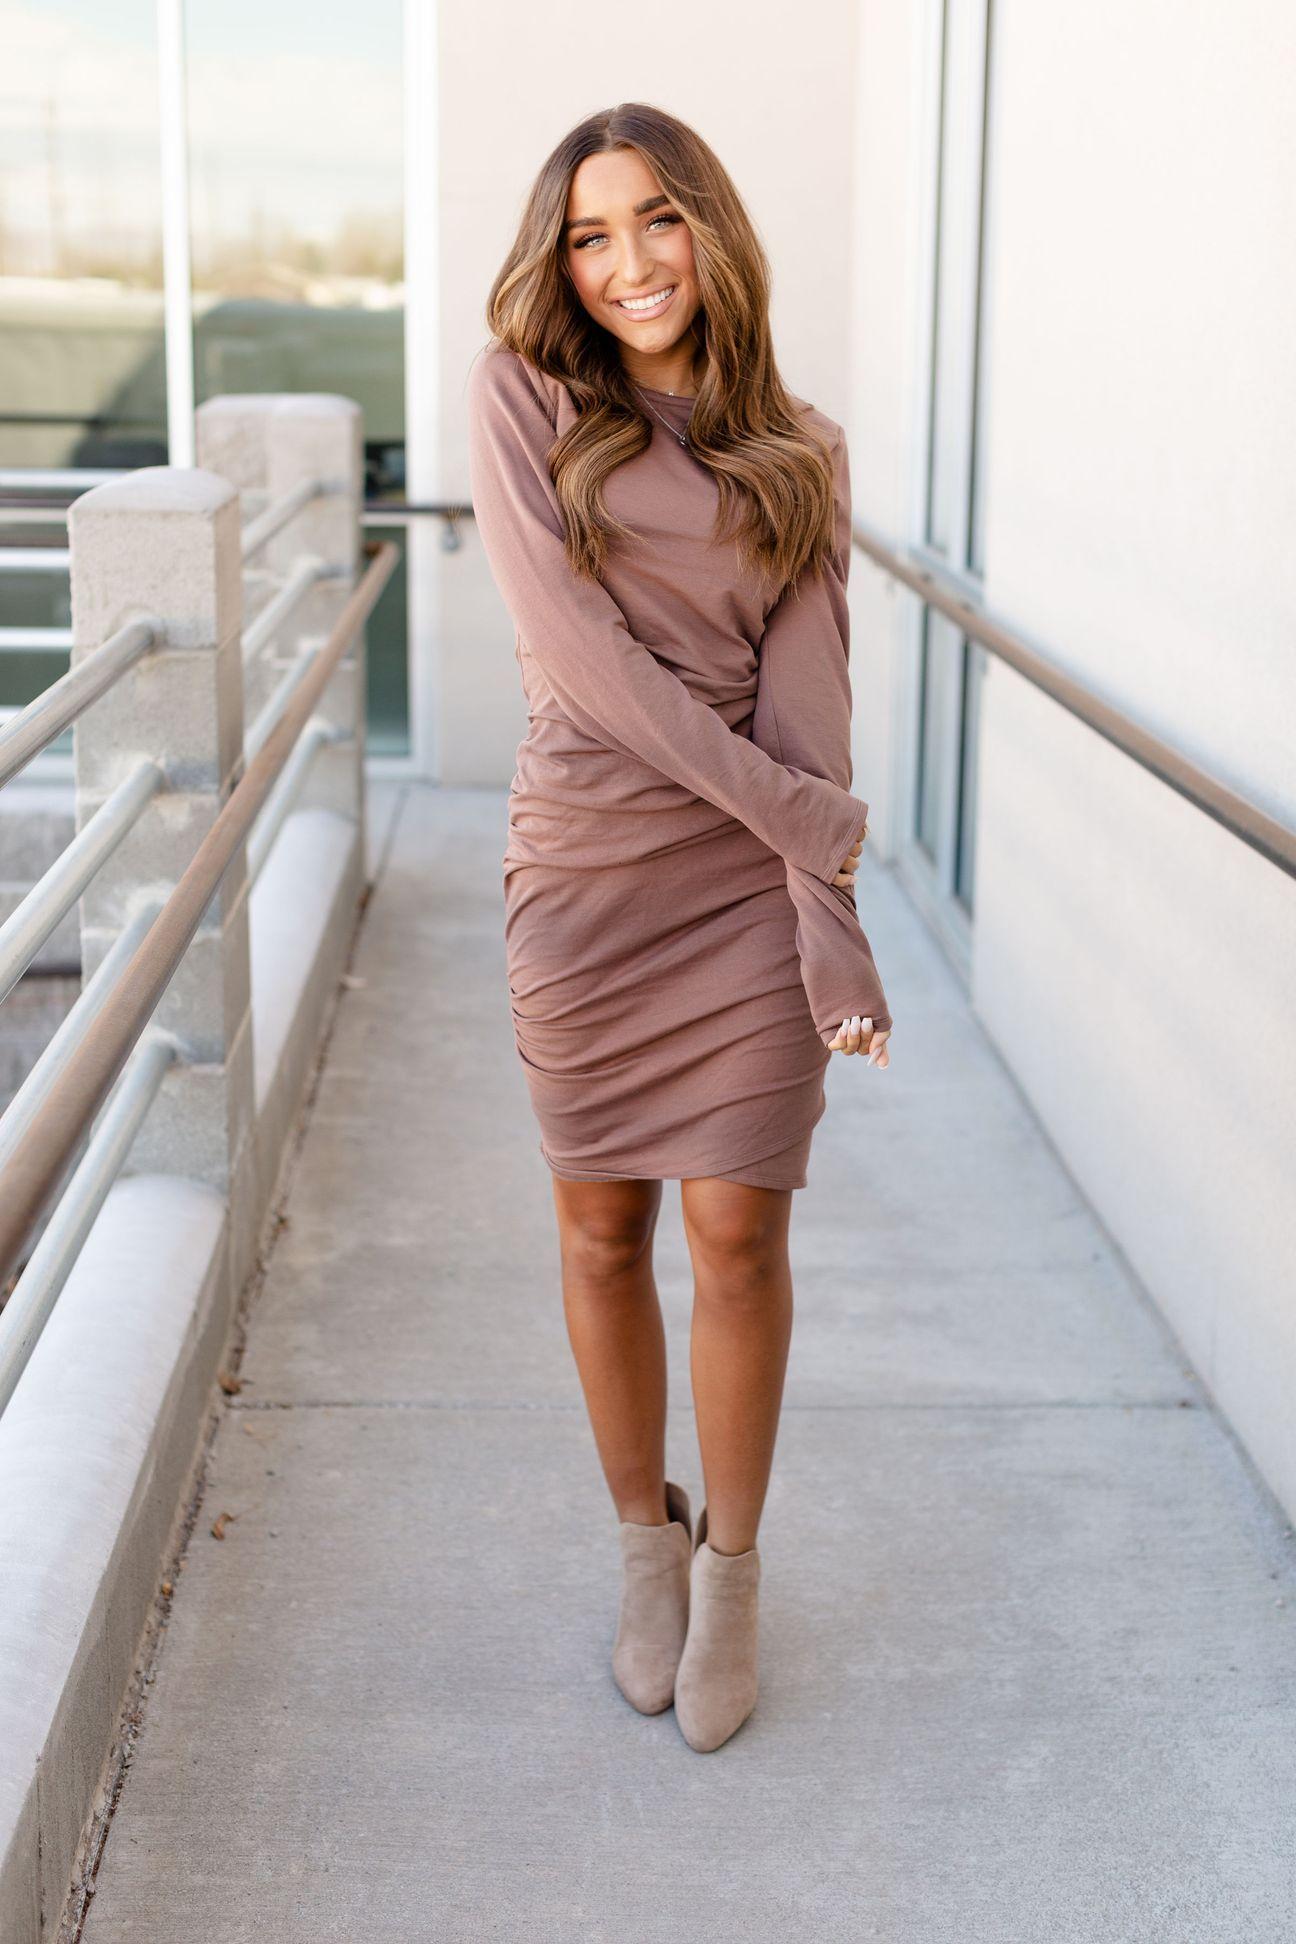 Long Sleeve Better Than Basic Dress Mocha Final Sale Long Sleeve Dress Outfit Long Sleeve Dress Winter Basic Dress [ 1944 x 1296 Pixel ]